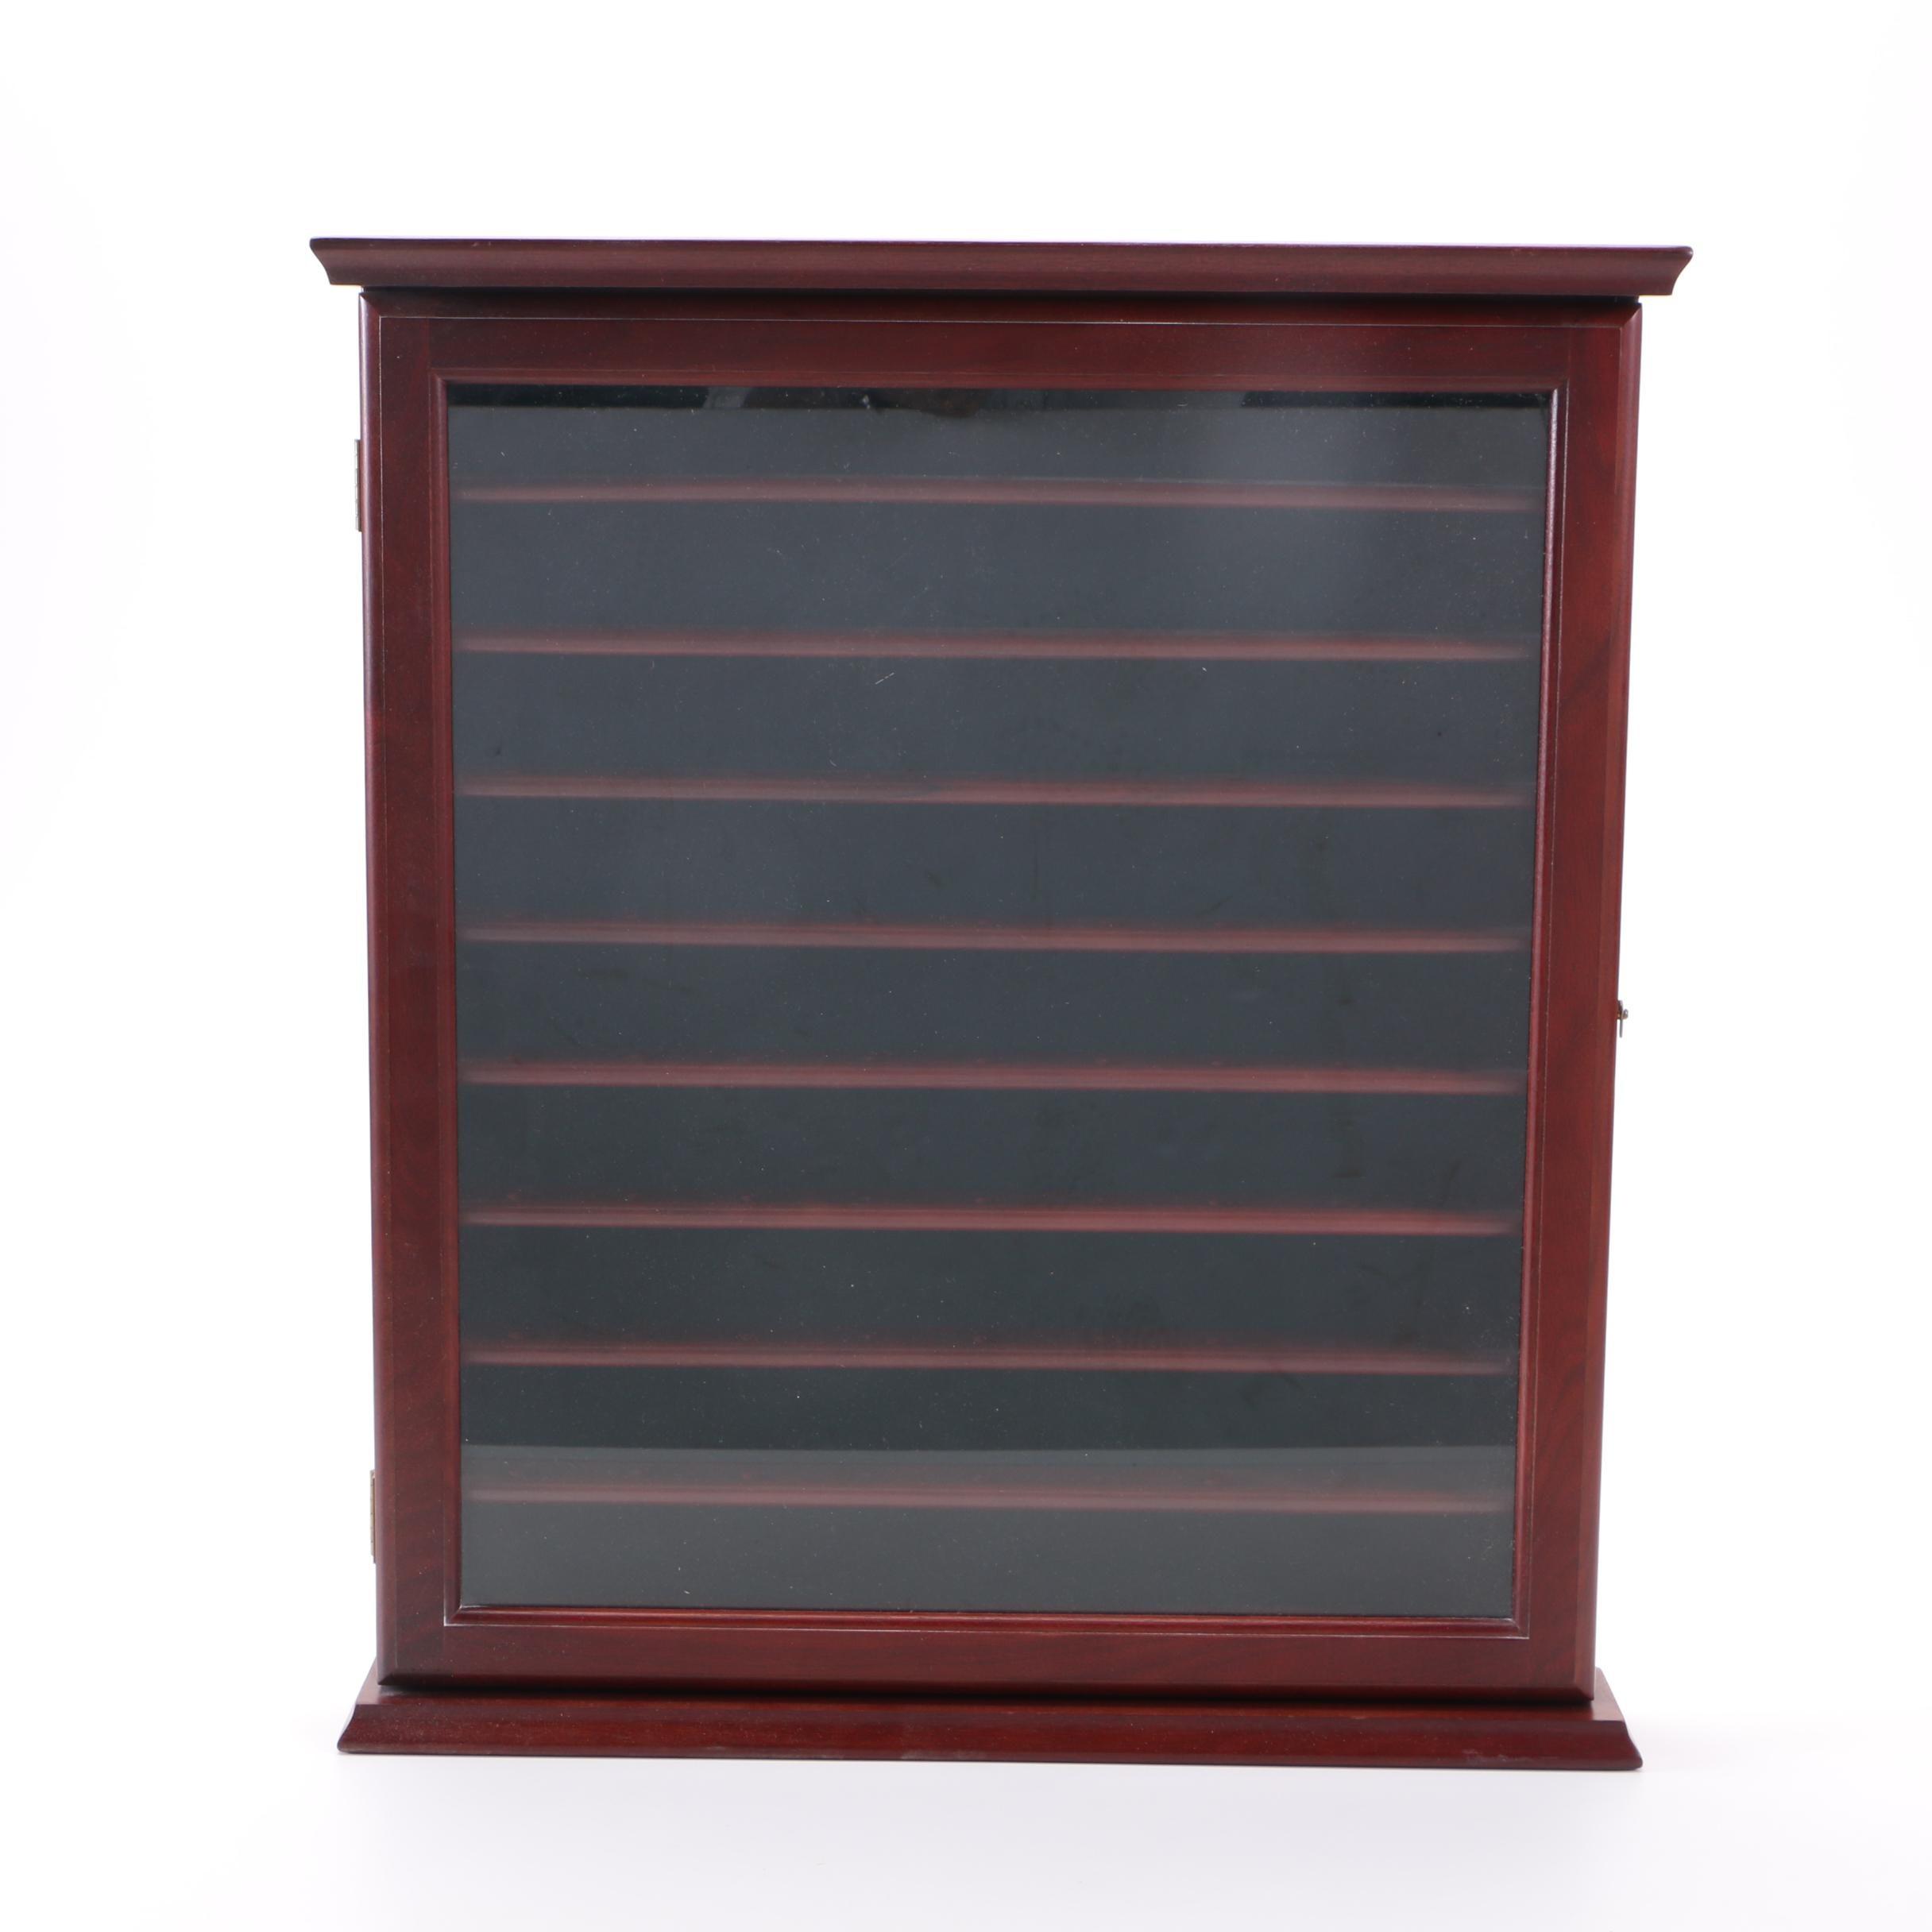 Glazed-Door Golf Ball Display Cabinet by Pro Golf